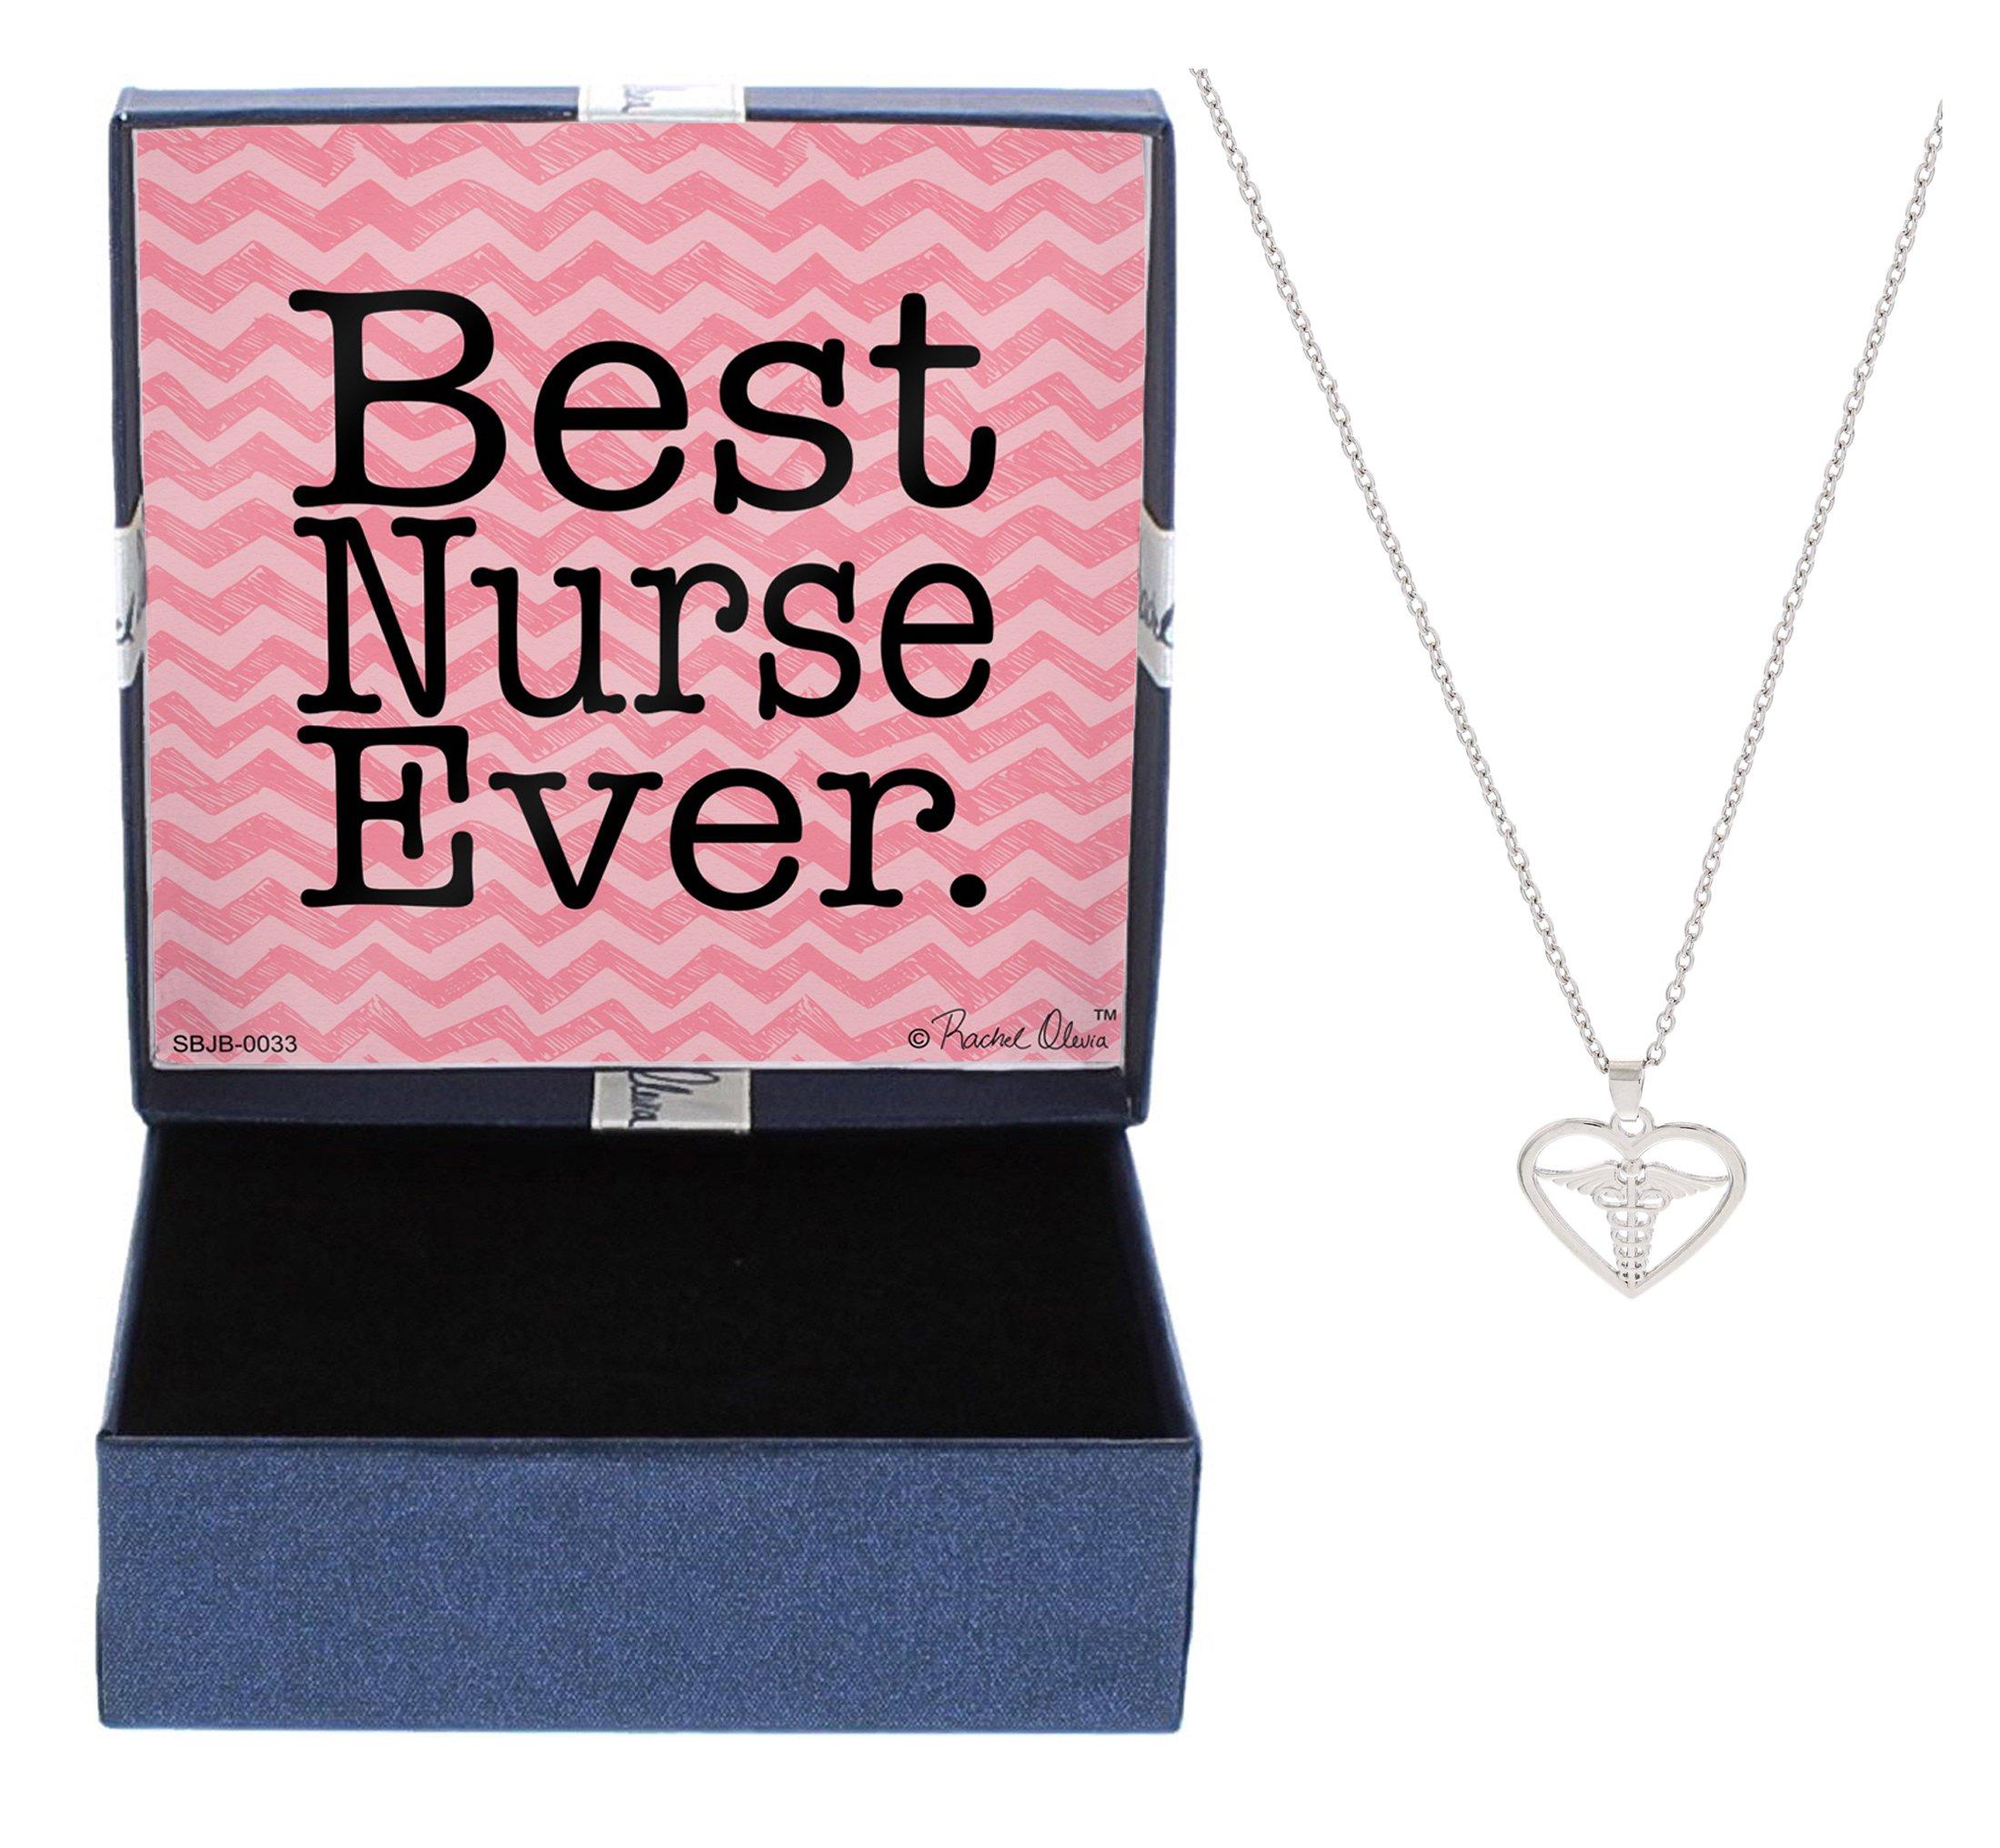 Nurse Gifts Best Nurse Ever Necklace Silver-Tone Heart Caduceus Pendant Necklace Jewelry Box Gift Jewelry Nurse RN Nurse Graduation Gift Mom Nurse Mom Gift